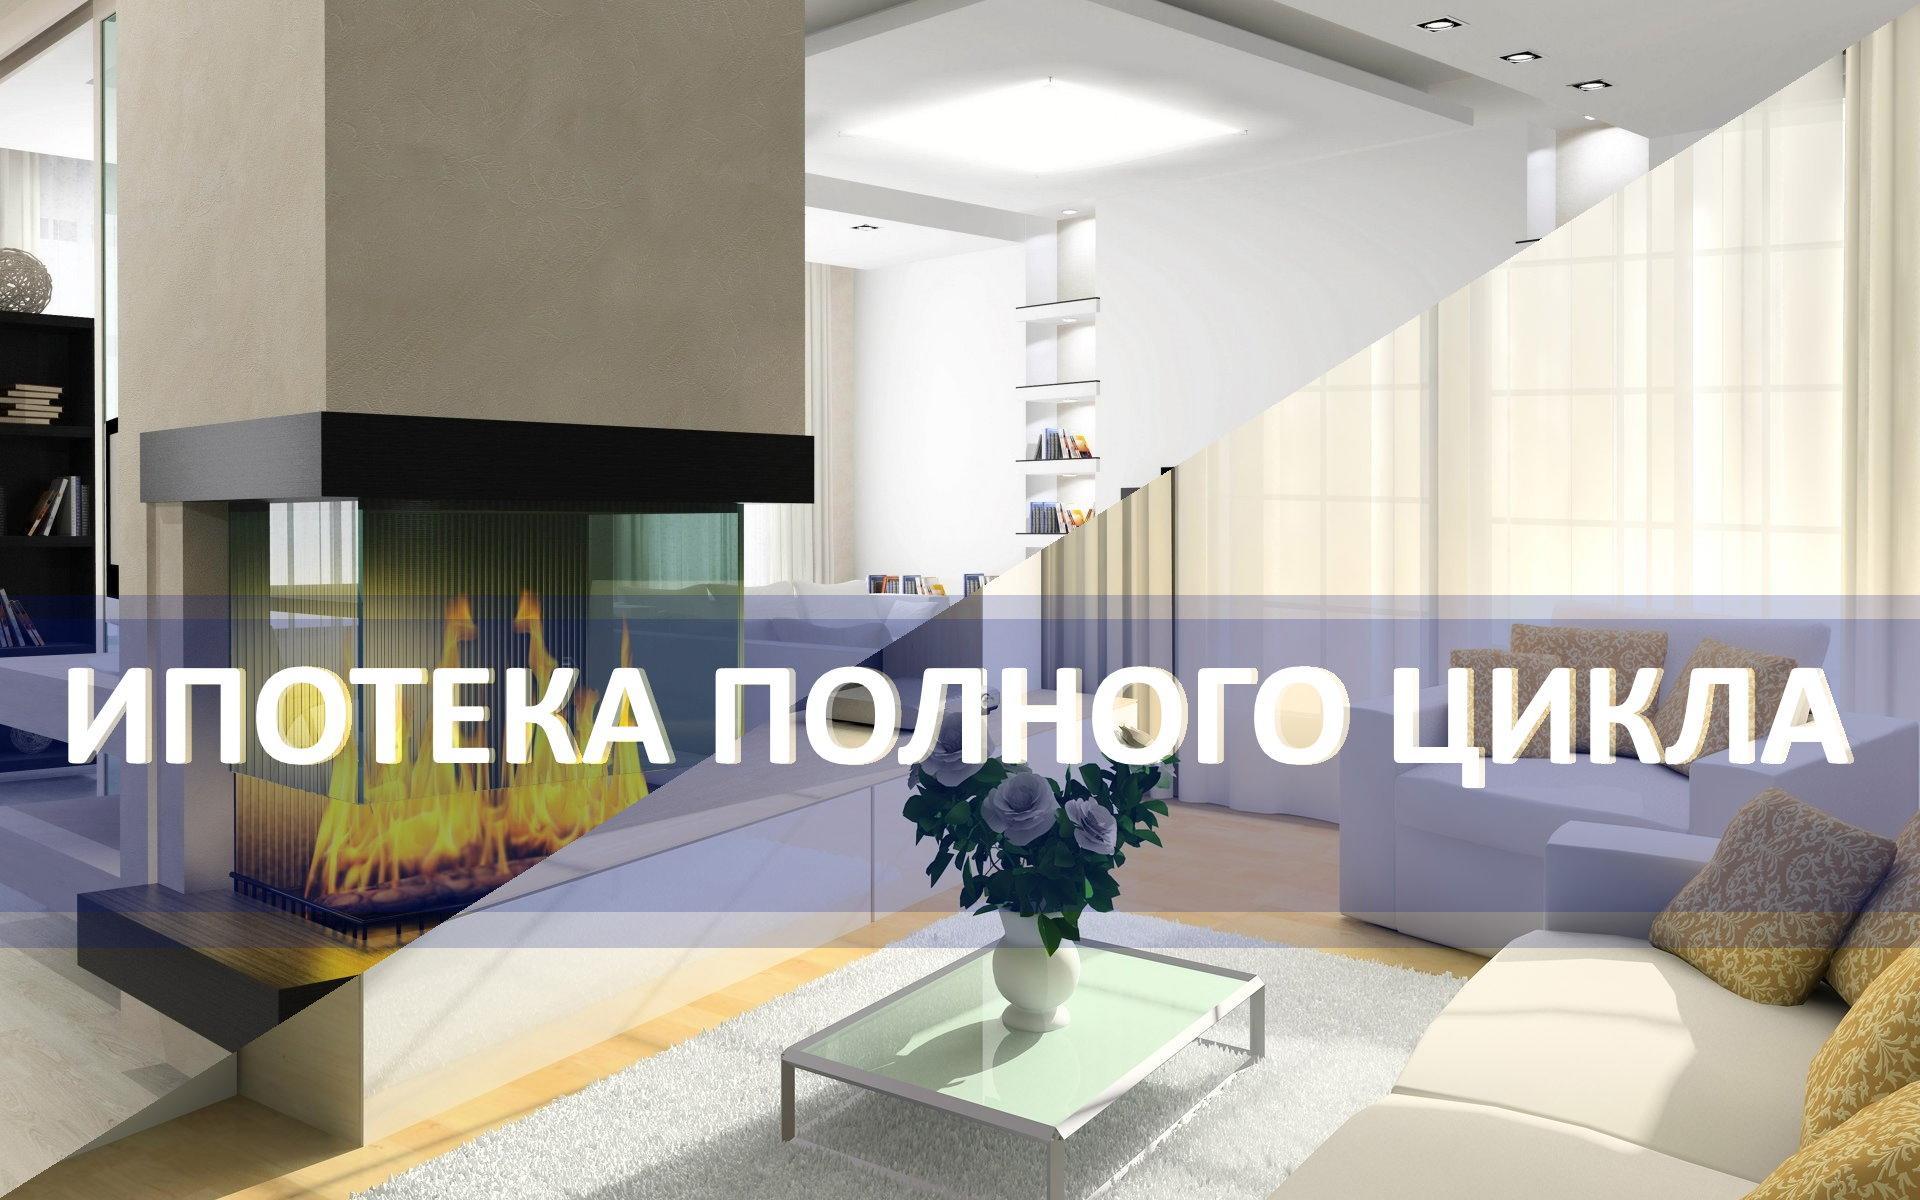 Ипотека для граждан СНГ